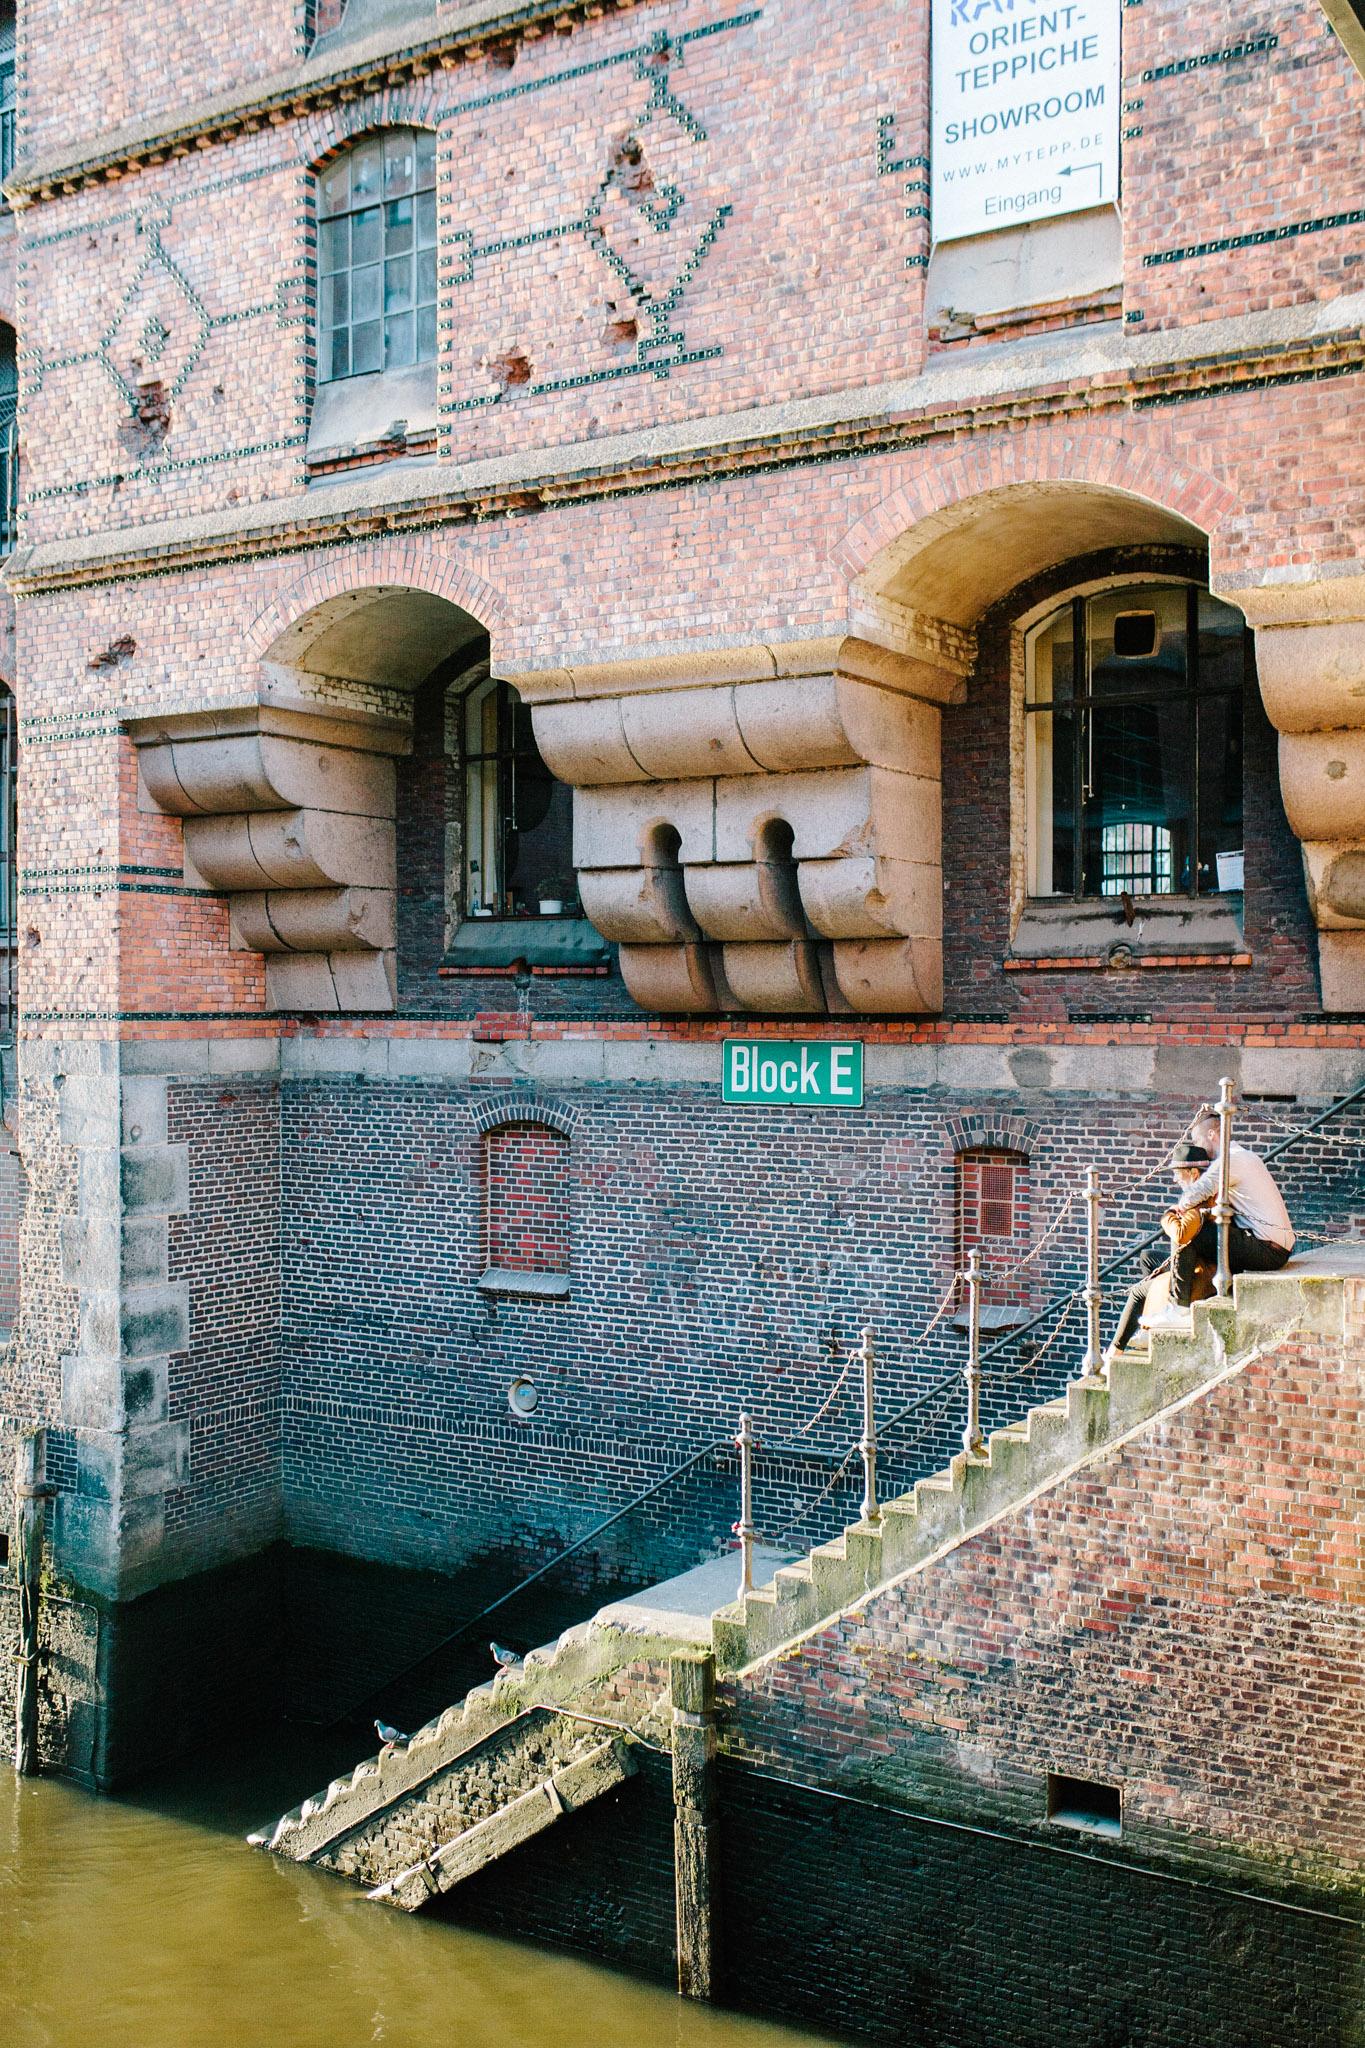 Speicherstadt-Hamburg-Engagement-Pia-Anna-Christian-Wedding-Photography-RJ-27.jpg